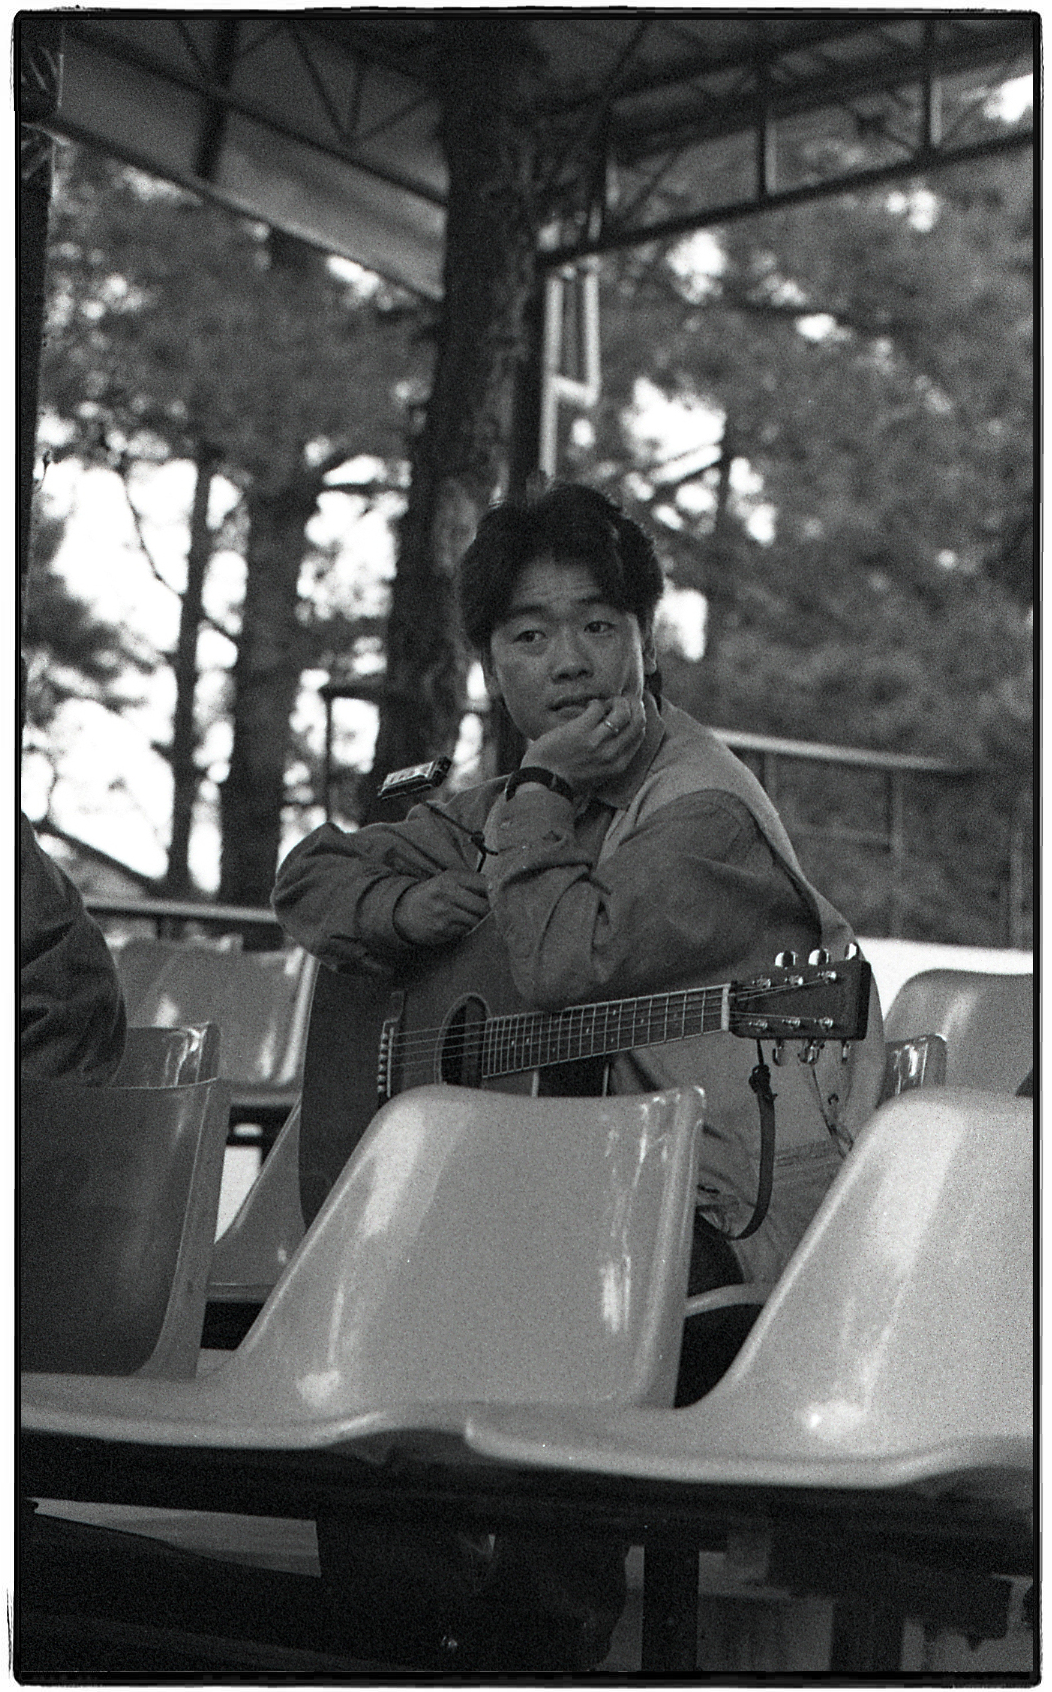 Photo by Jong-jin Im